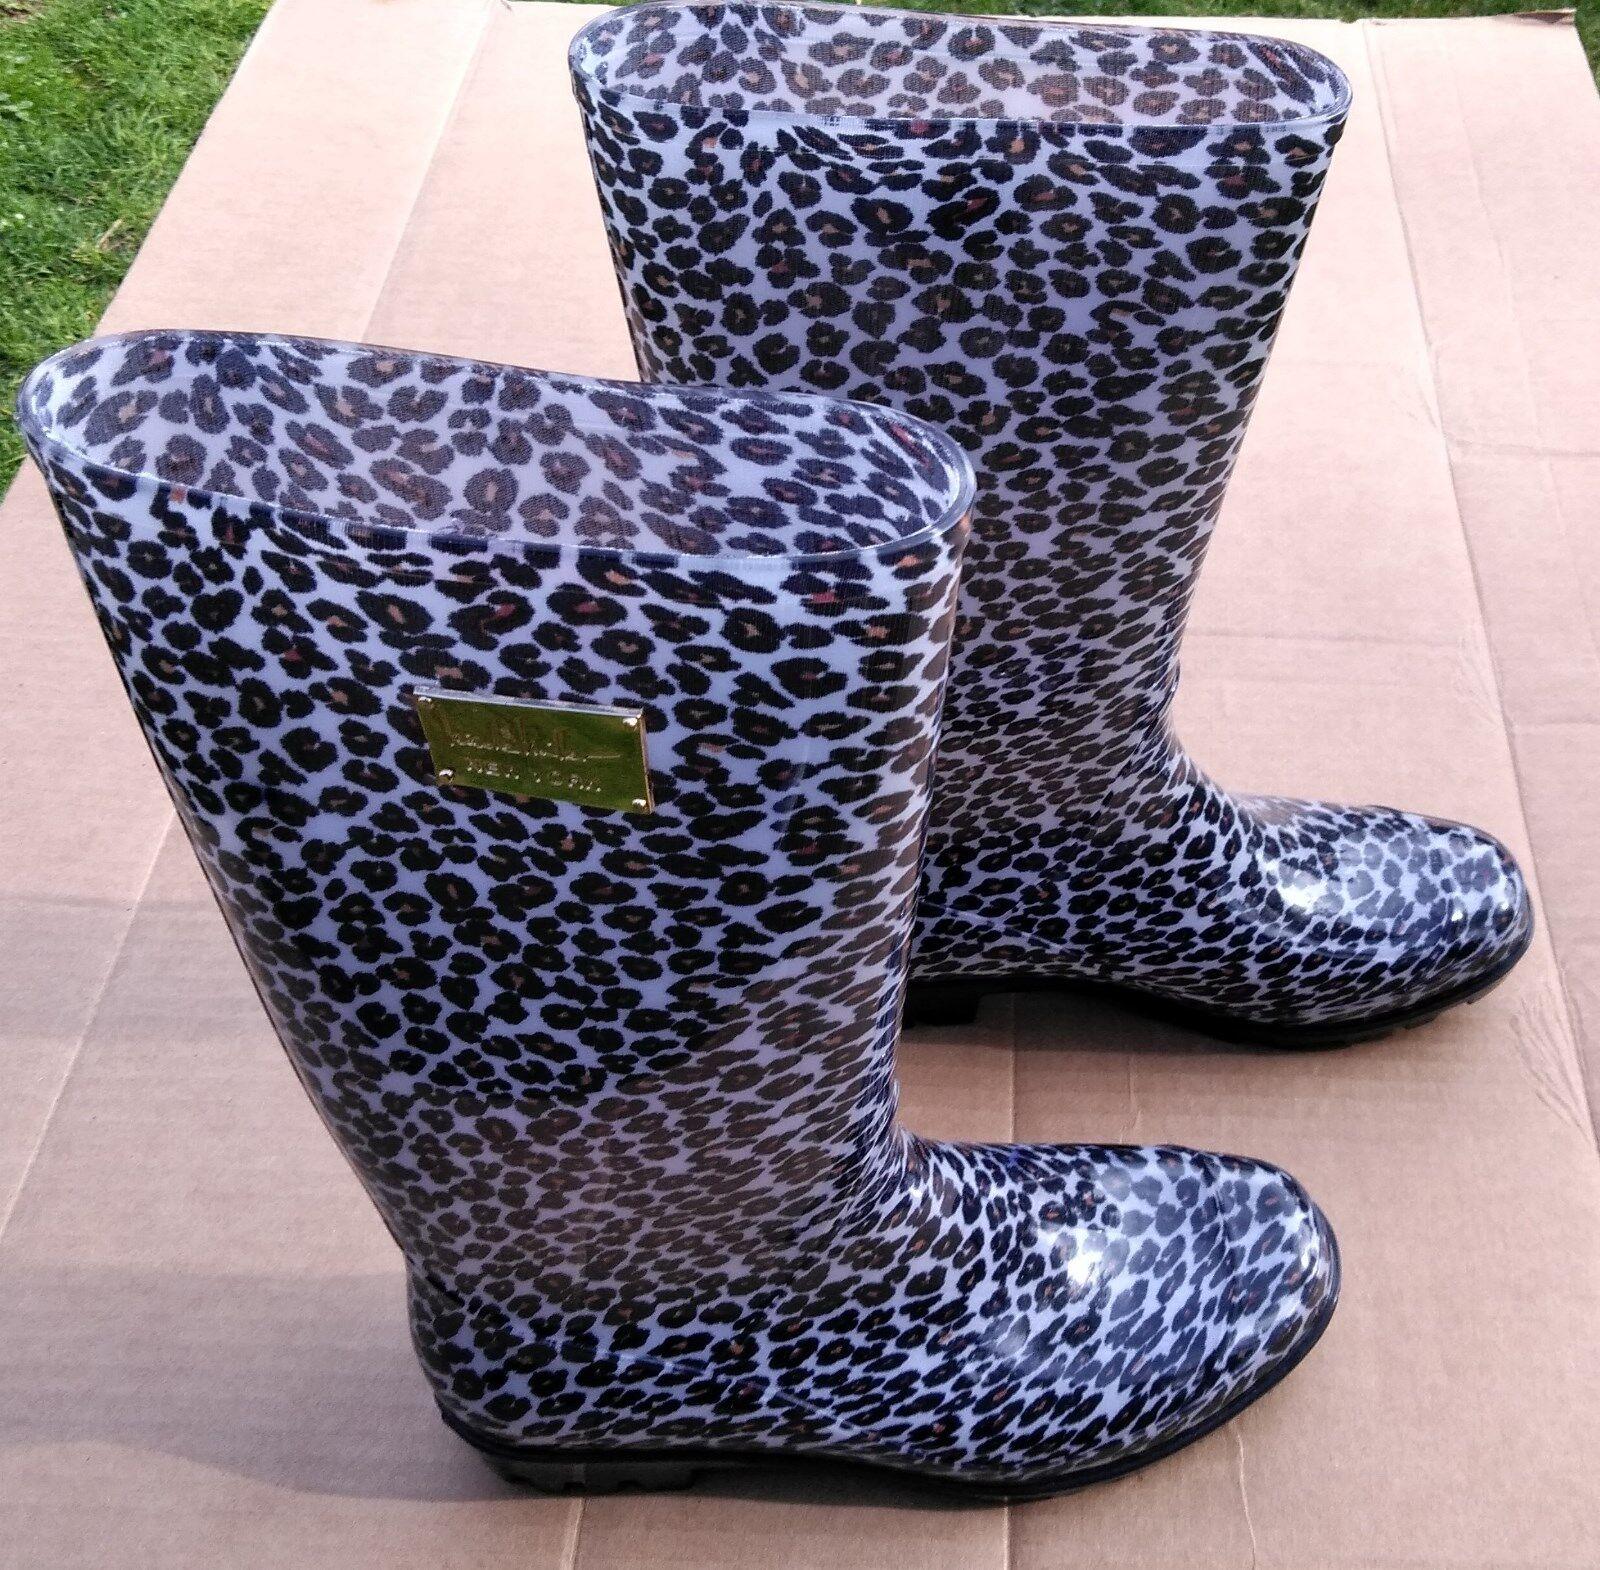 Nicole Miller Lepoard Print Plastic Rain Boots Excellent Hardly Worn 7 M